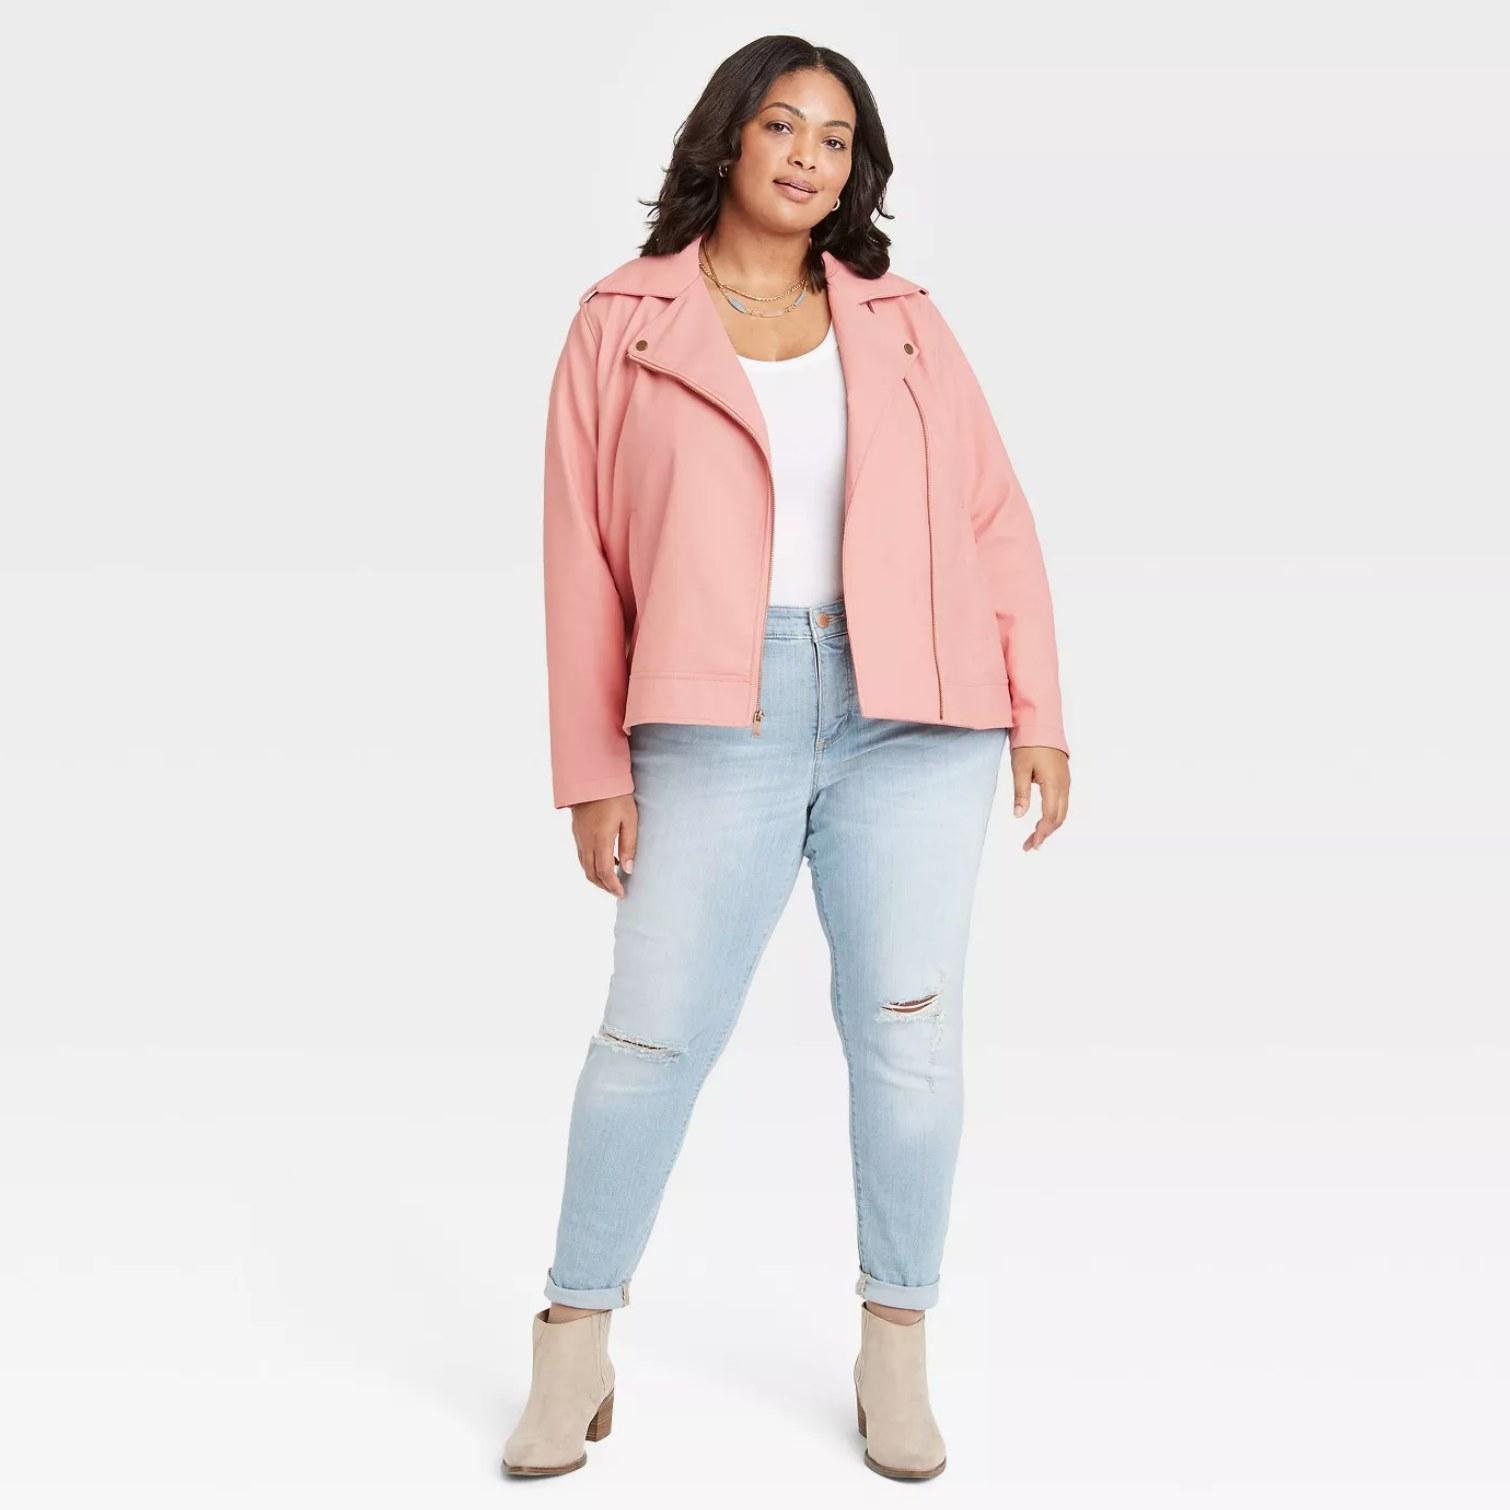 Plus-sized model wearing the jacket